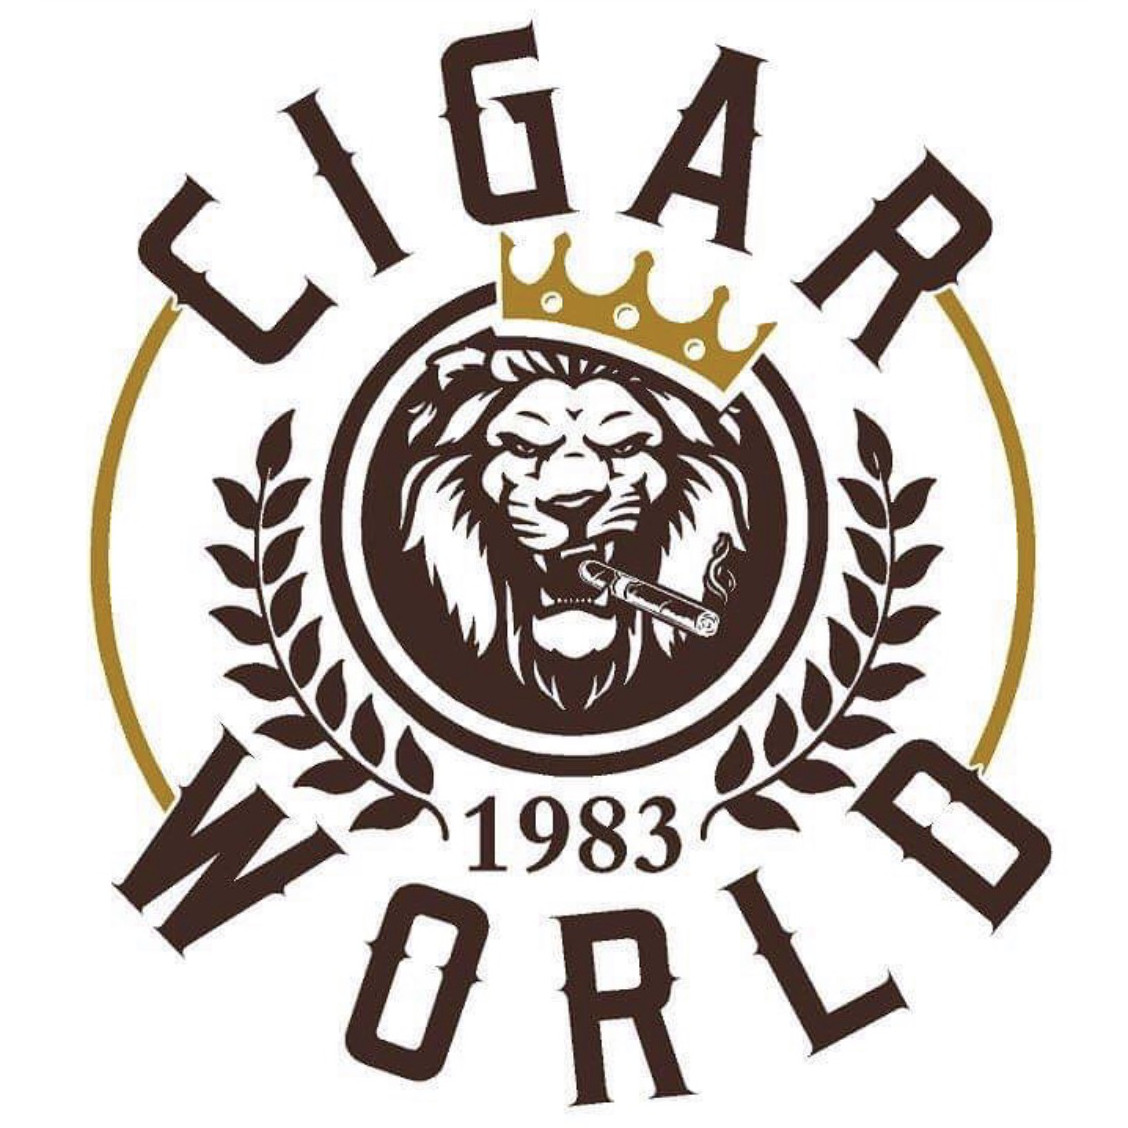 Cigar World Ltd